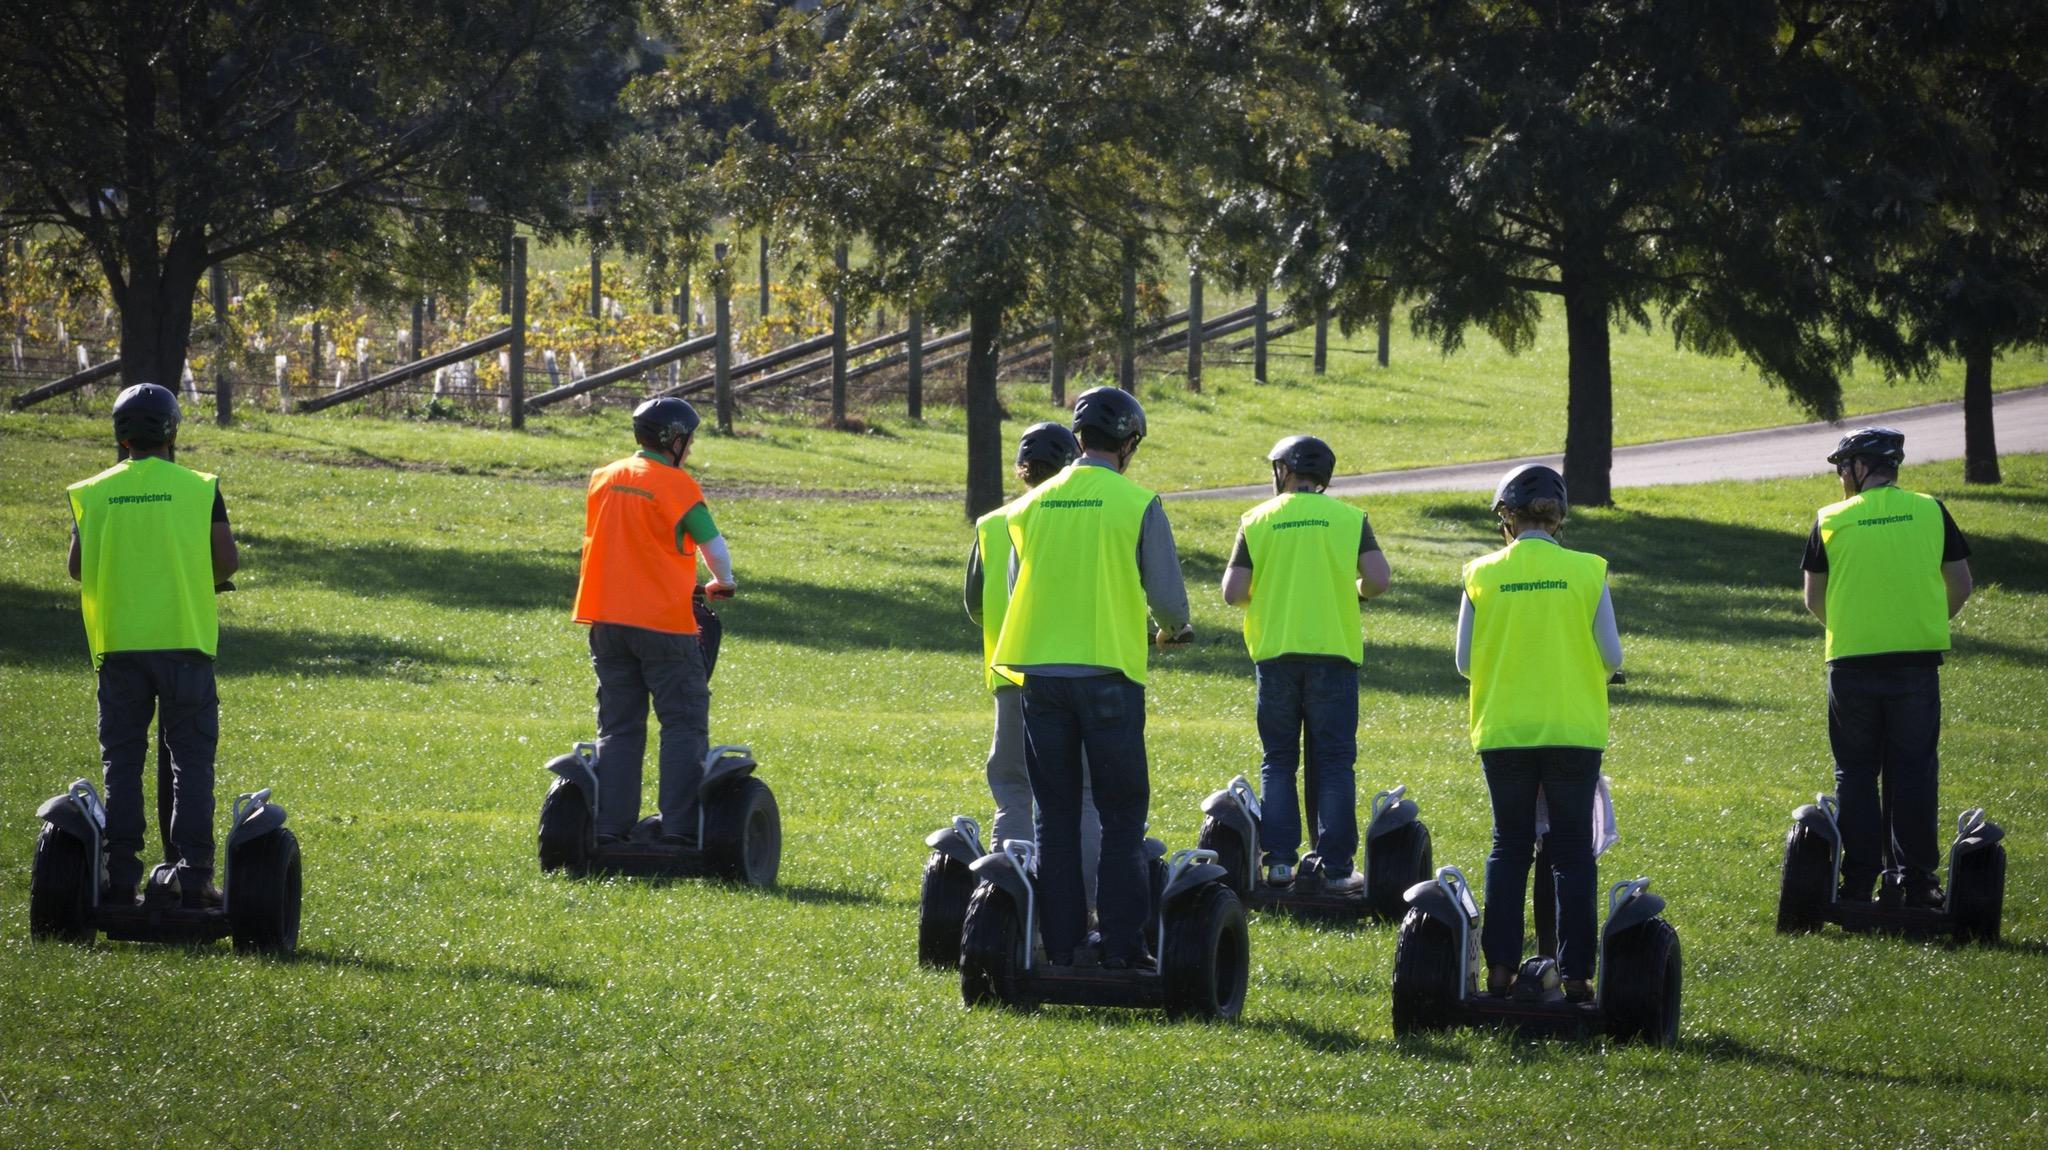 Segway tour Yarra Valley